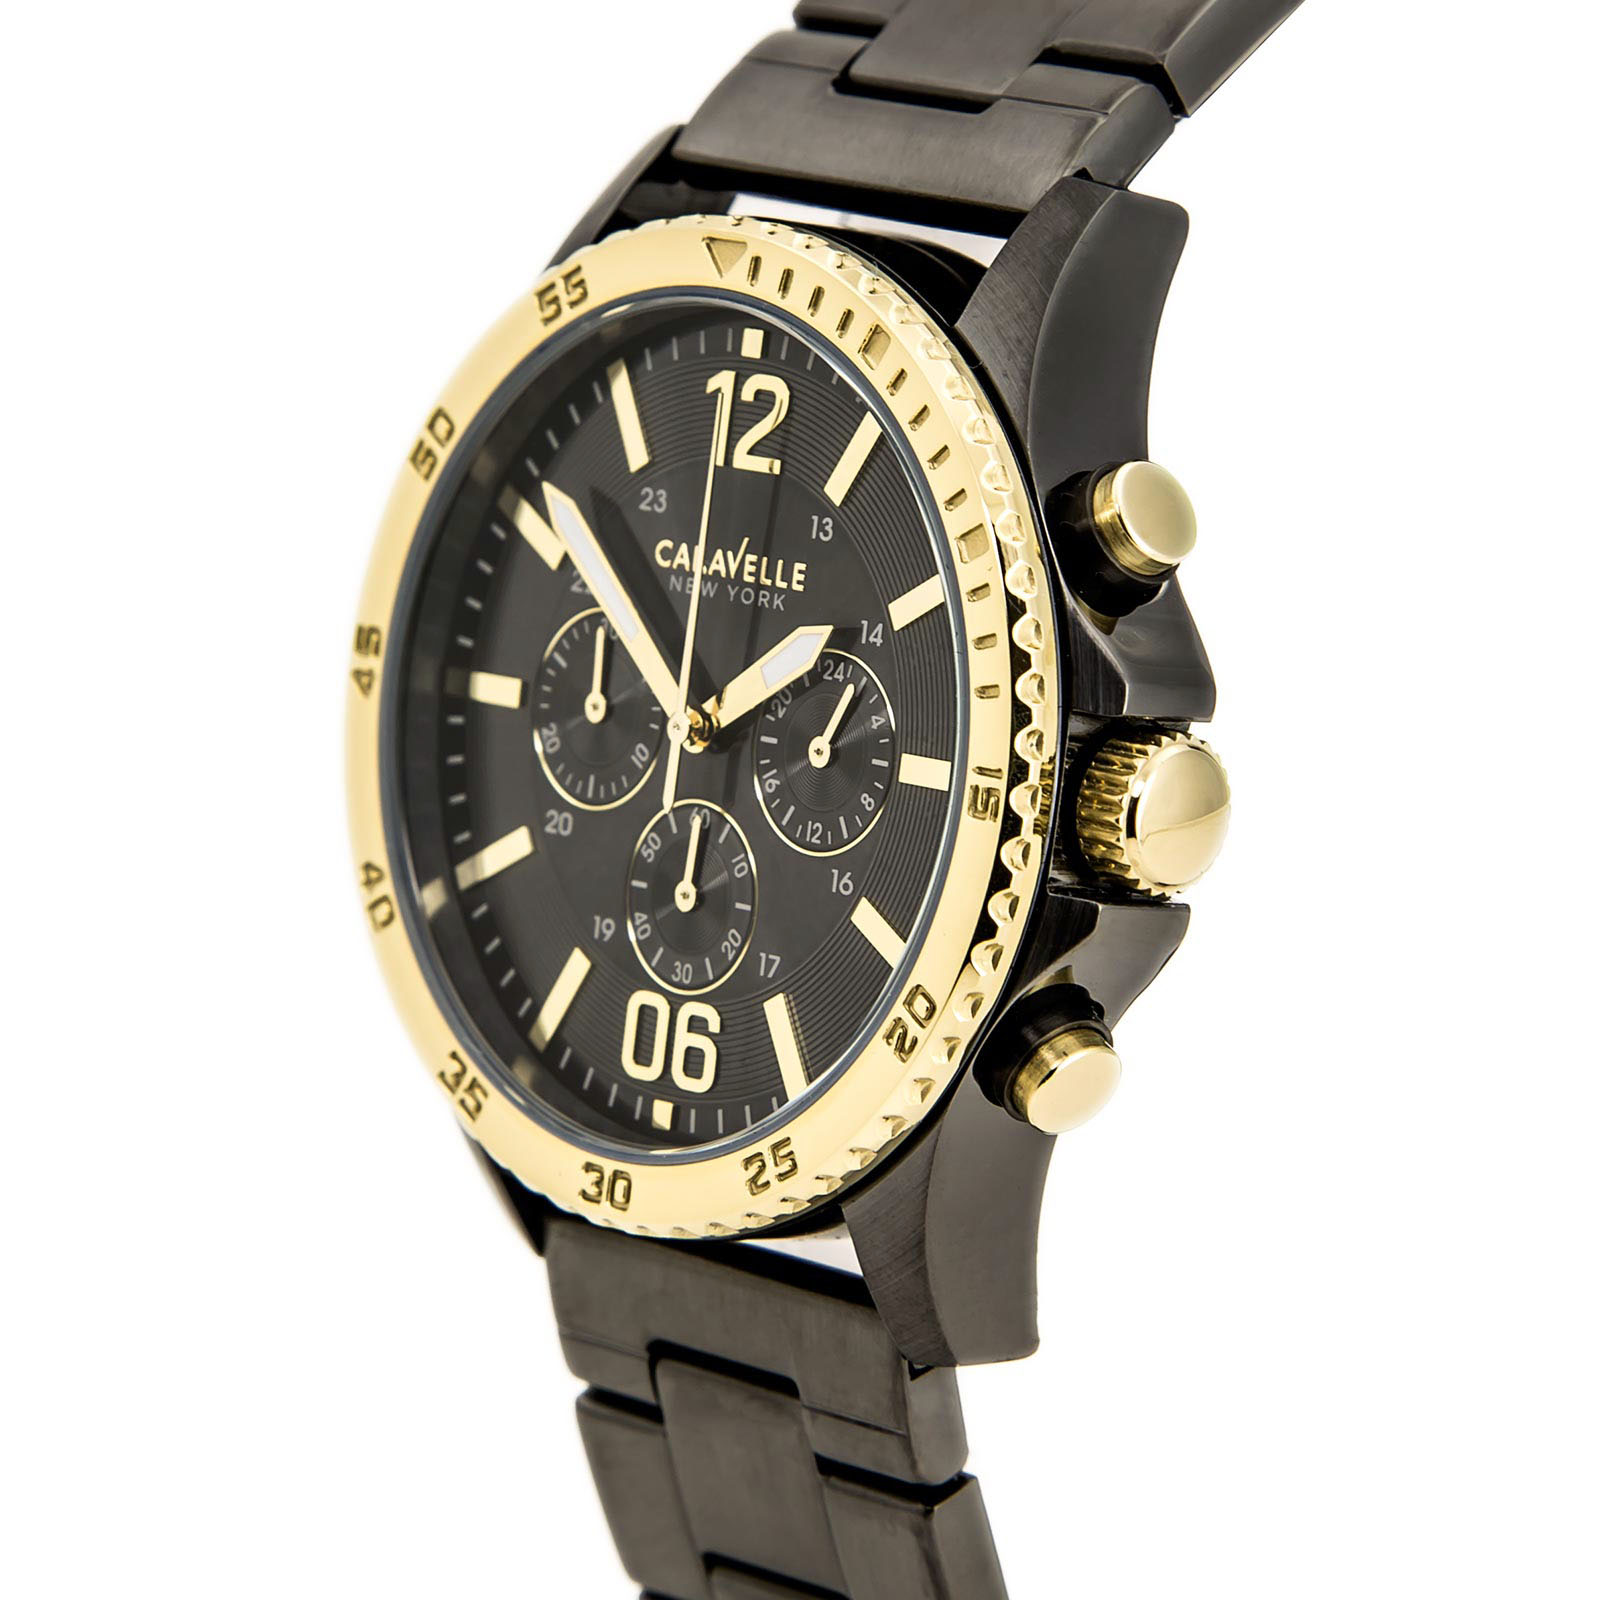 45A119 Caravelle New York Men's Analog Chronograph Display Japanese Quartz Black Watch